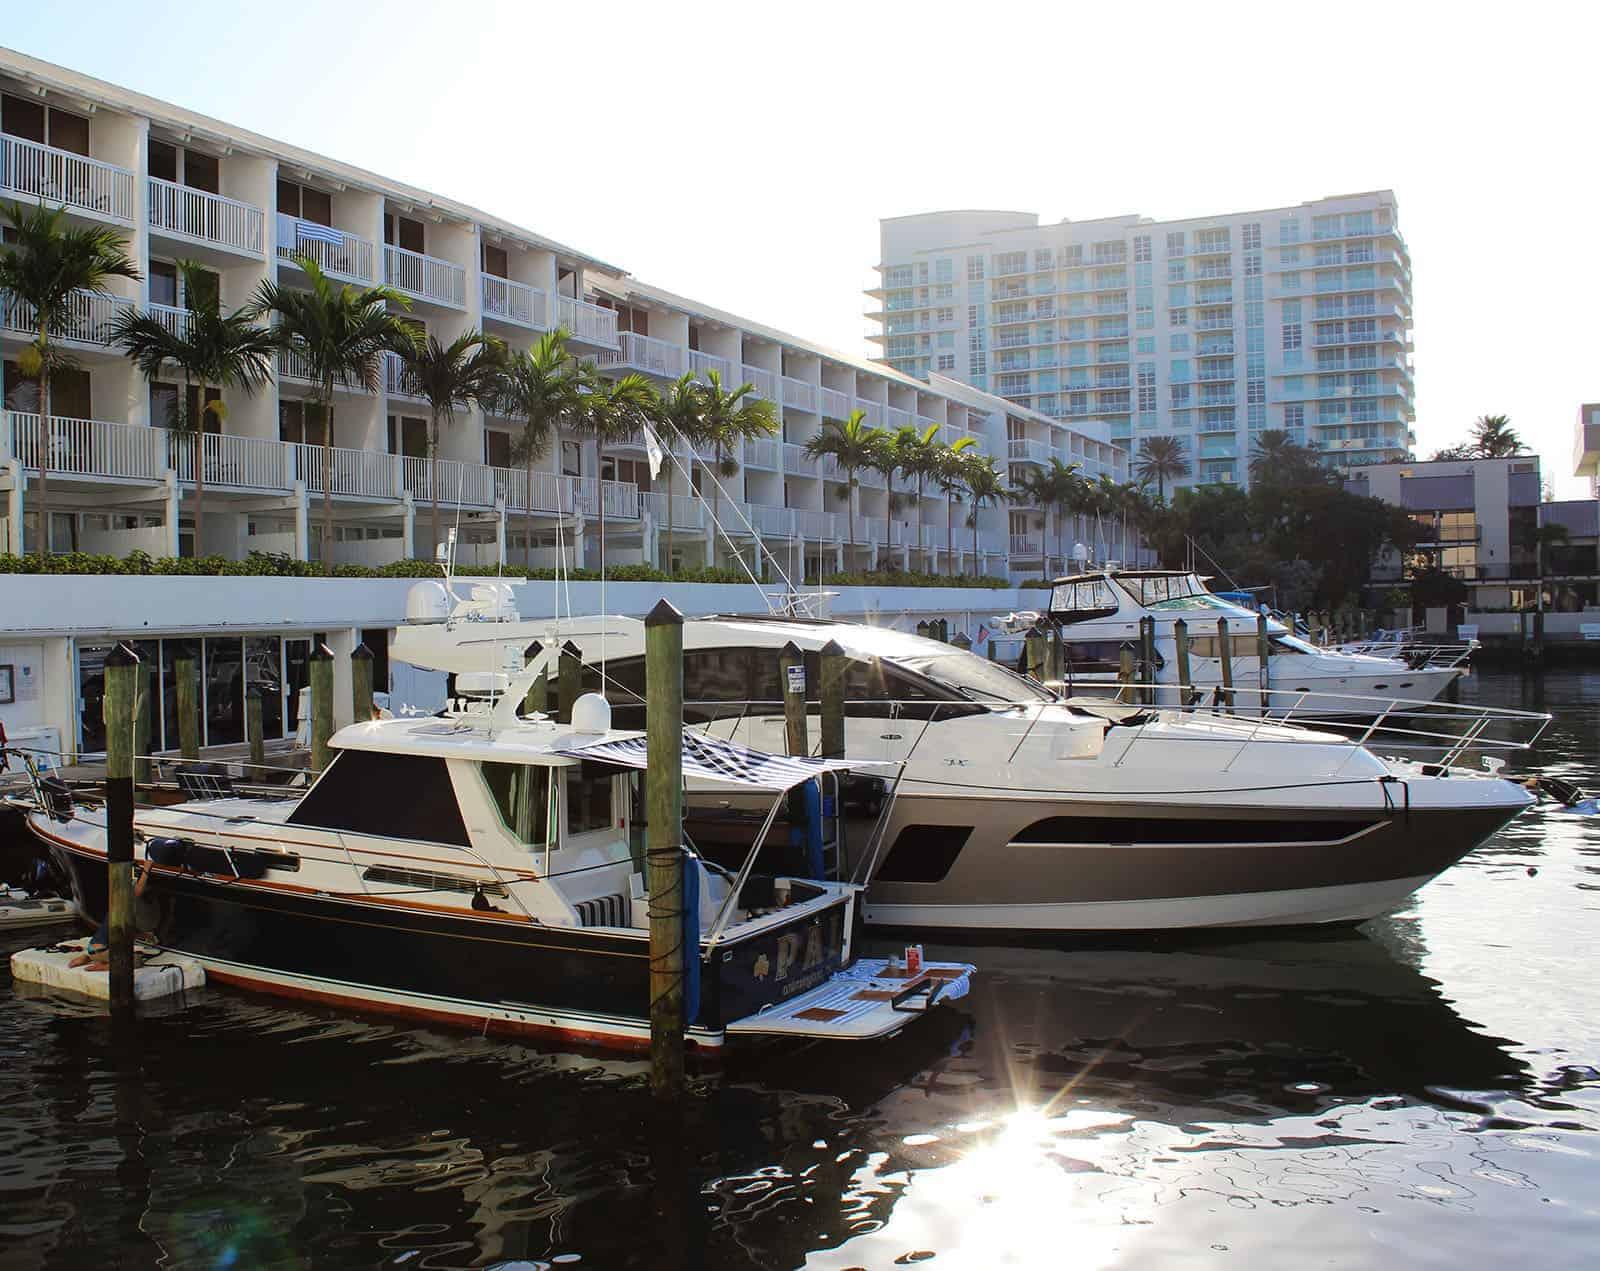 Hilton Fort Lauderdale Marina Hotel